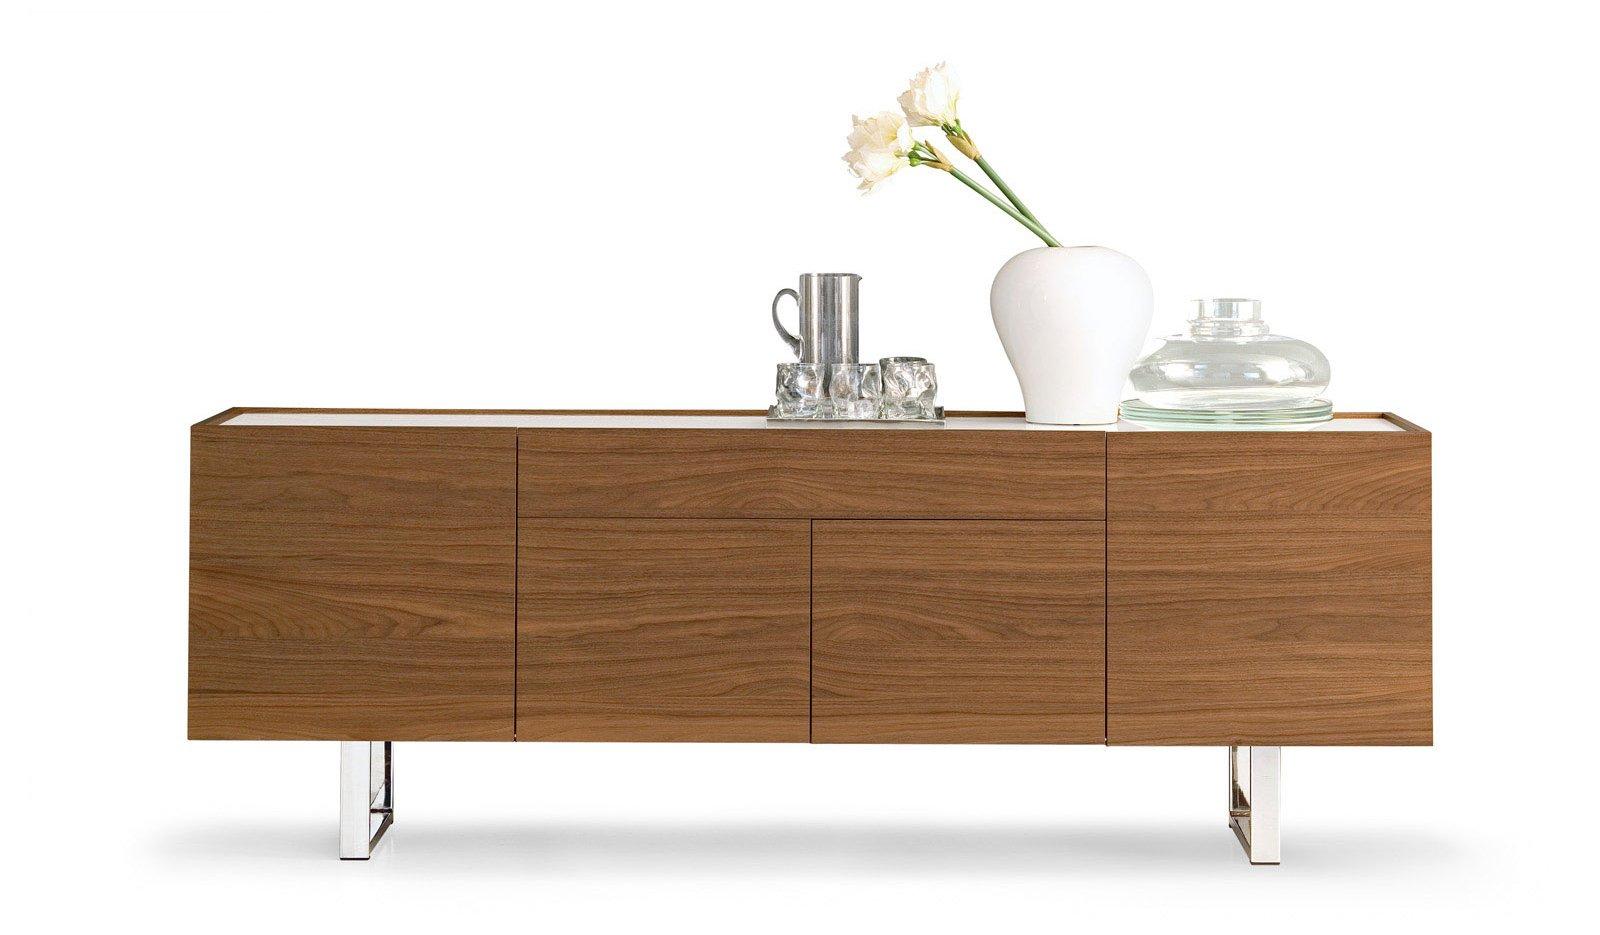 Madie mobili bassi per contenere cose di casa - Mobili cucina ikea credenza acciaio ...